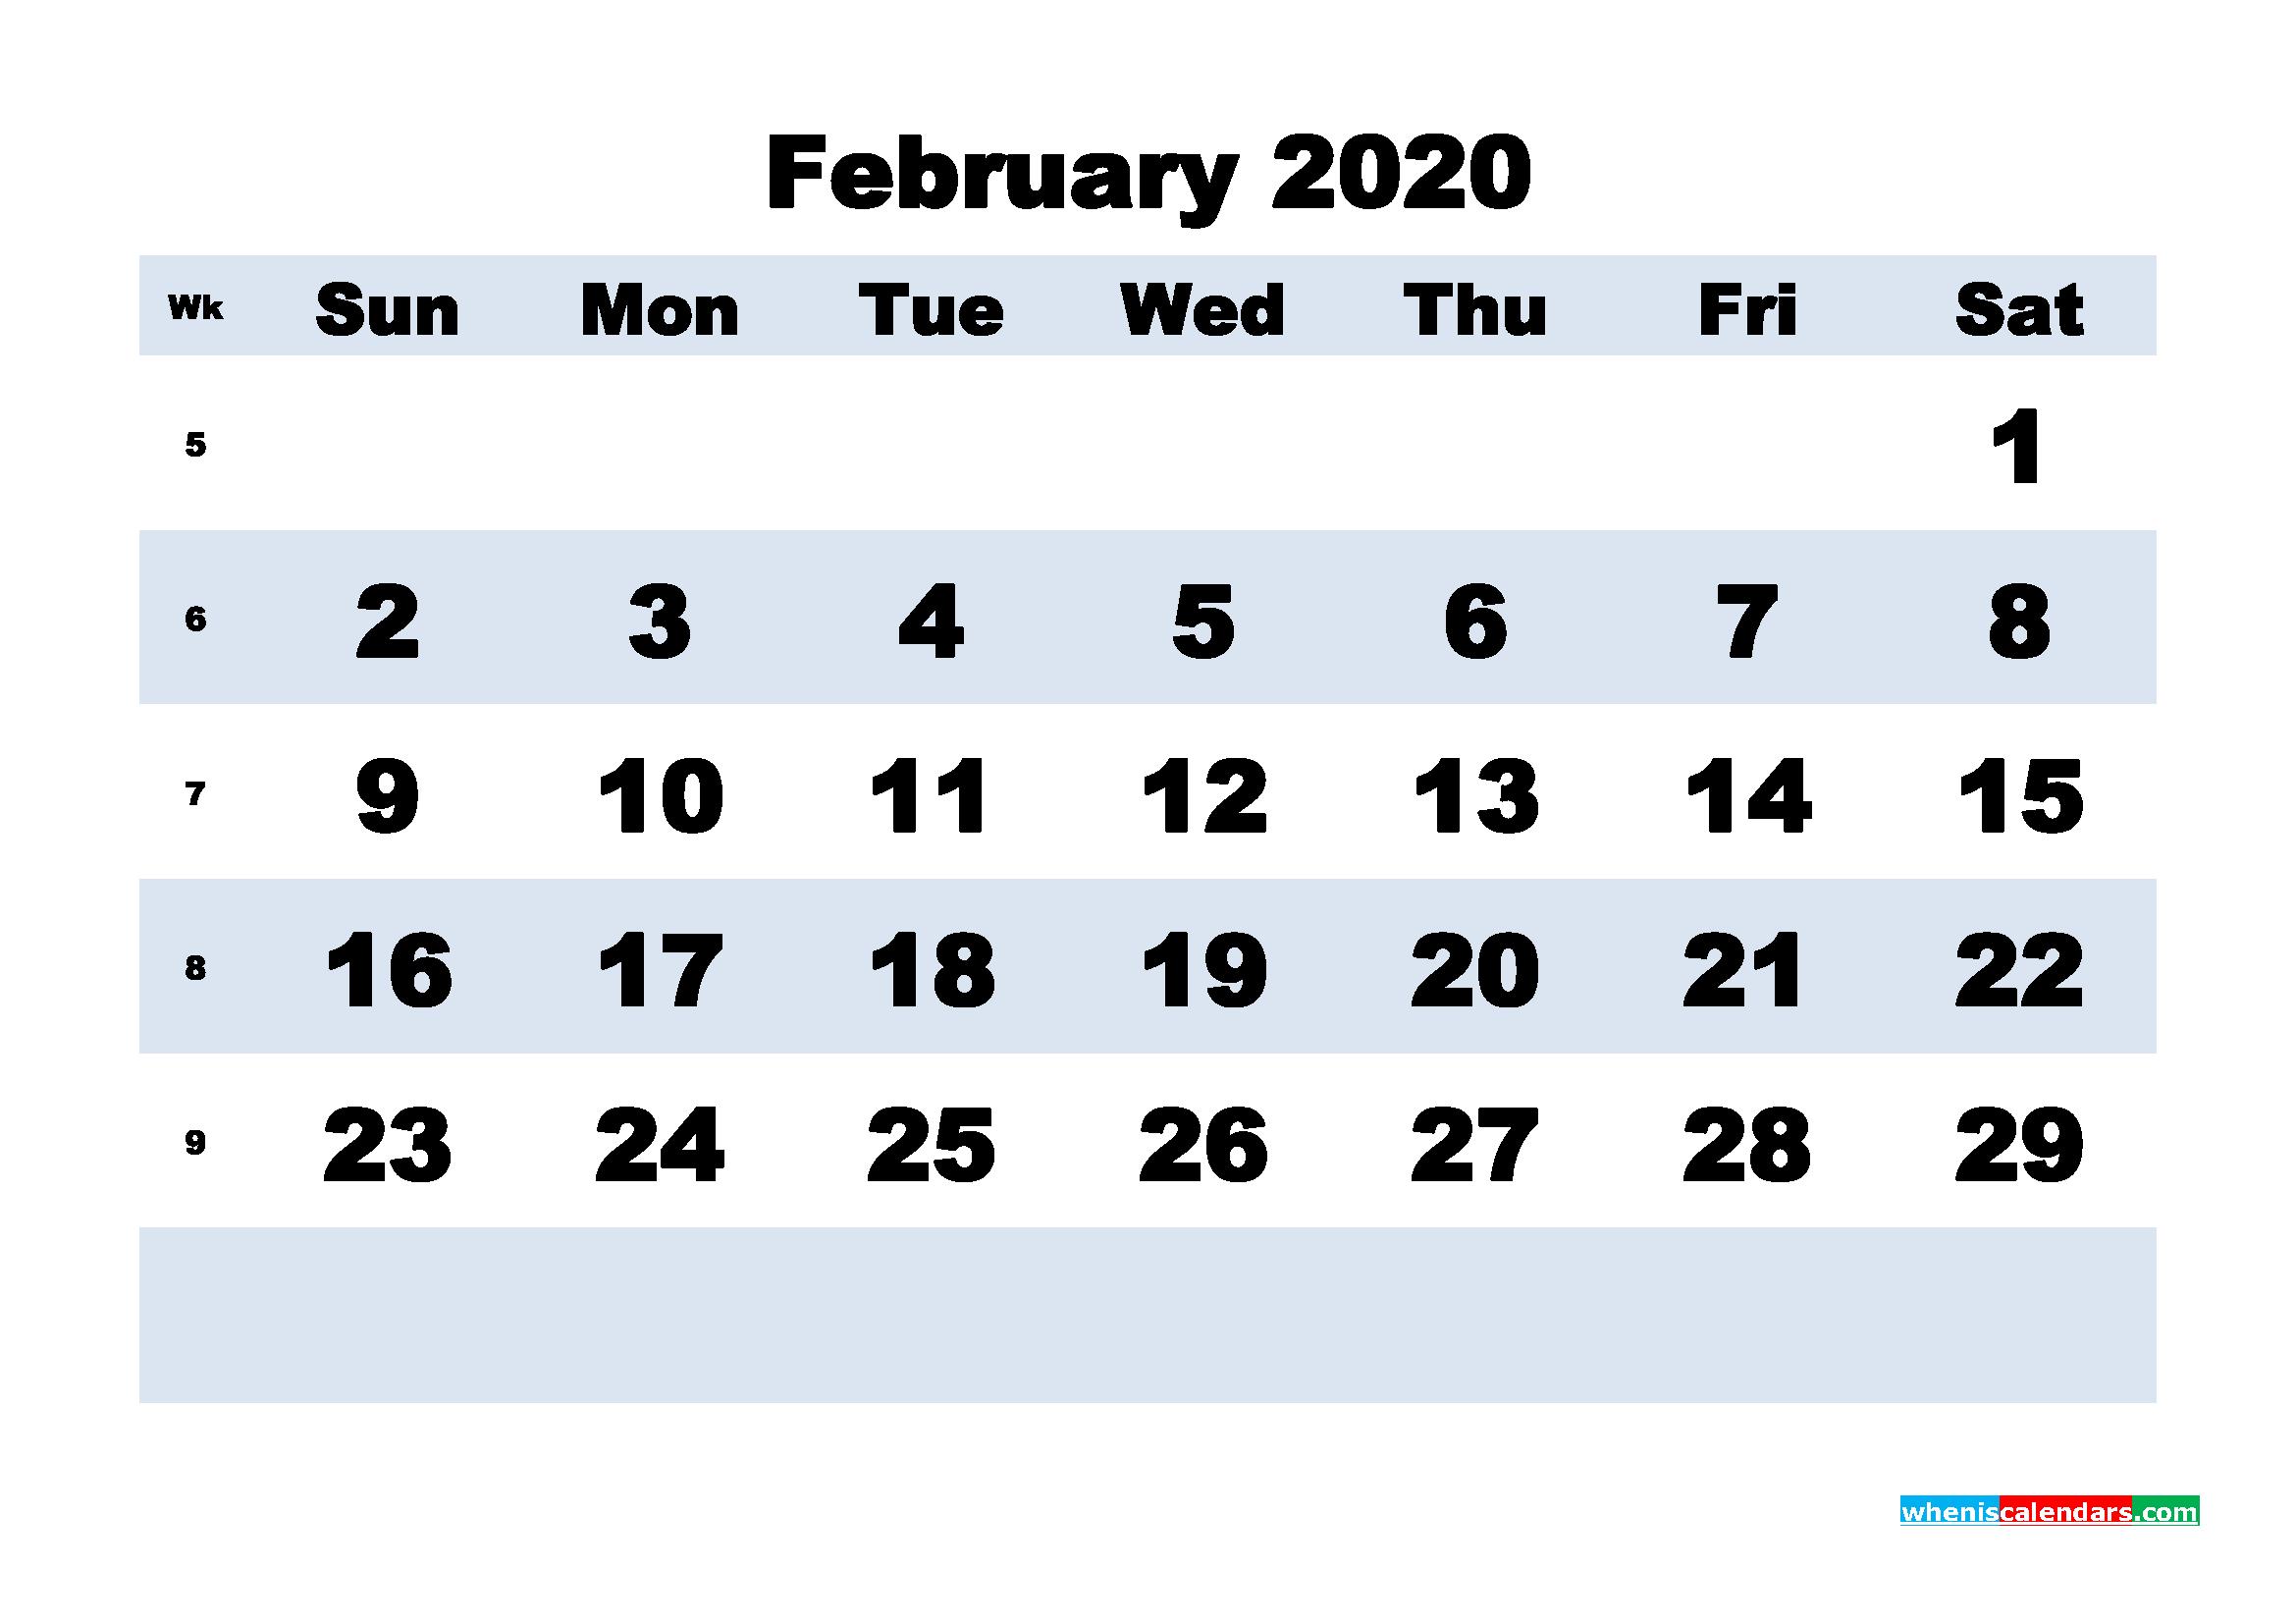 February Printable Calendar 2020 PDF, Word - No.m20b158